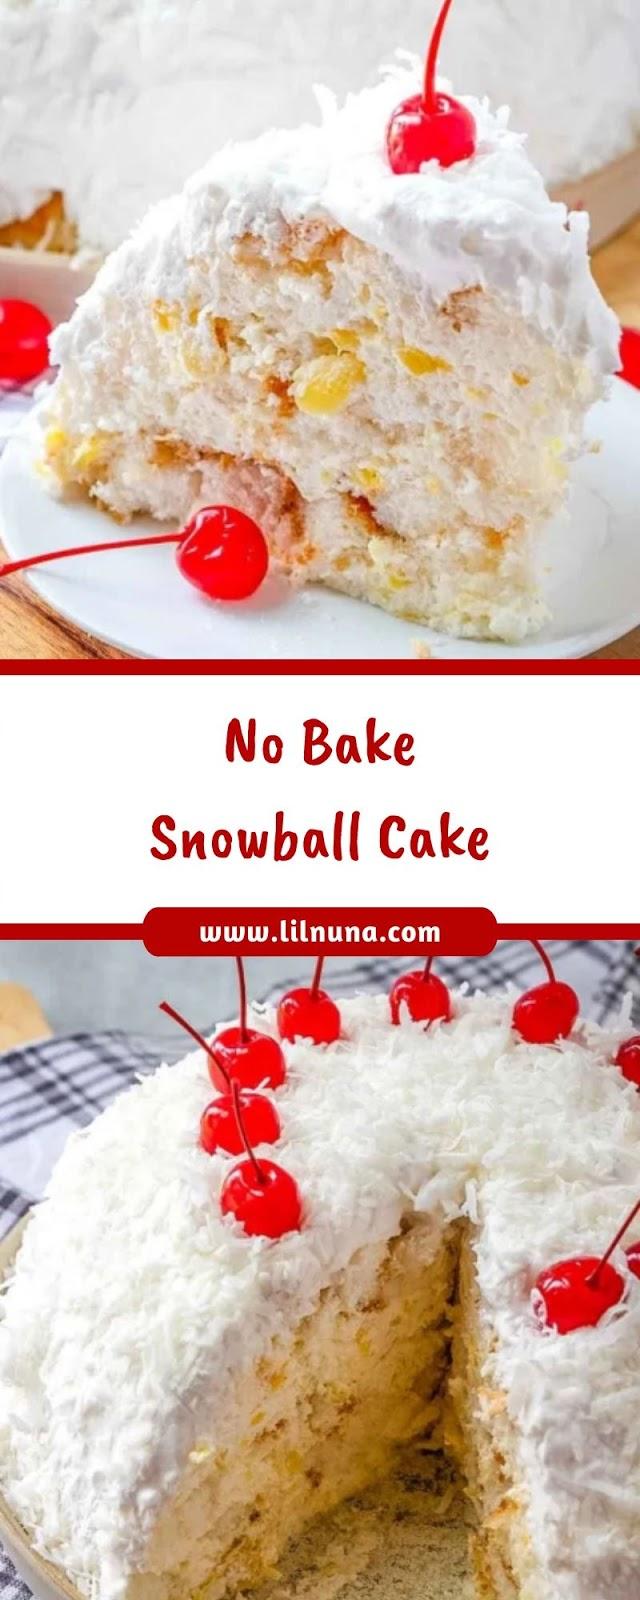 No Bake Snowball Cake